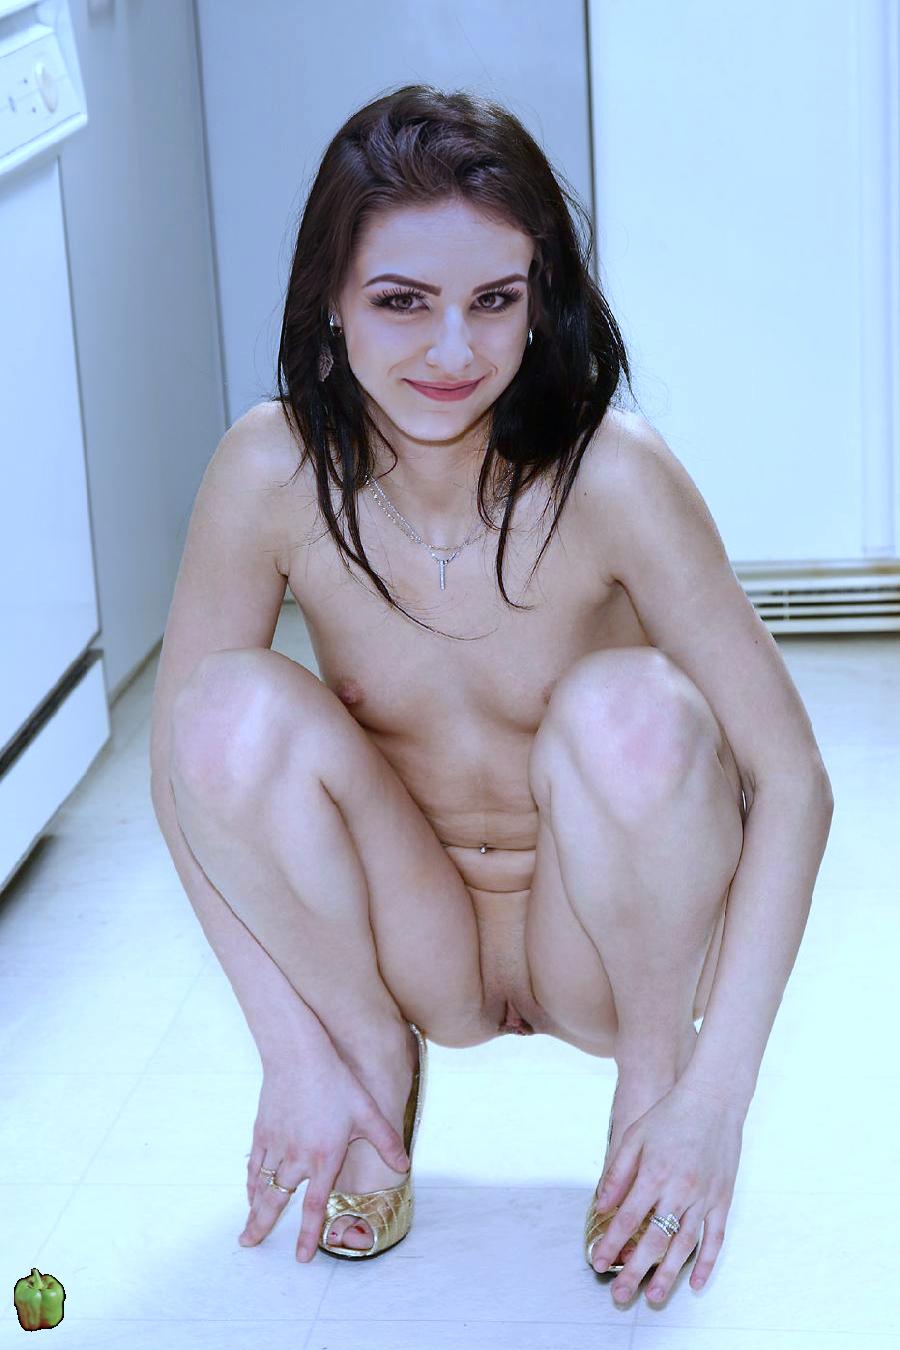 Vladmodel Dasha Ultra Model Hot Girls Wallpaper | Photo ...